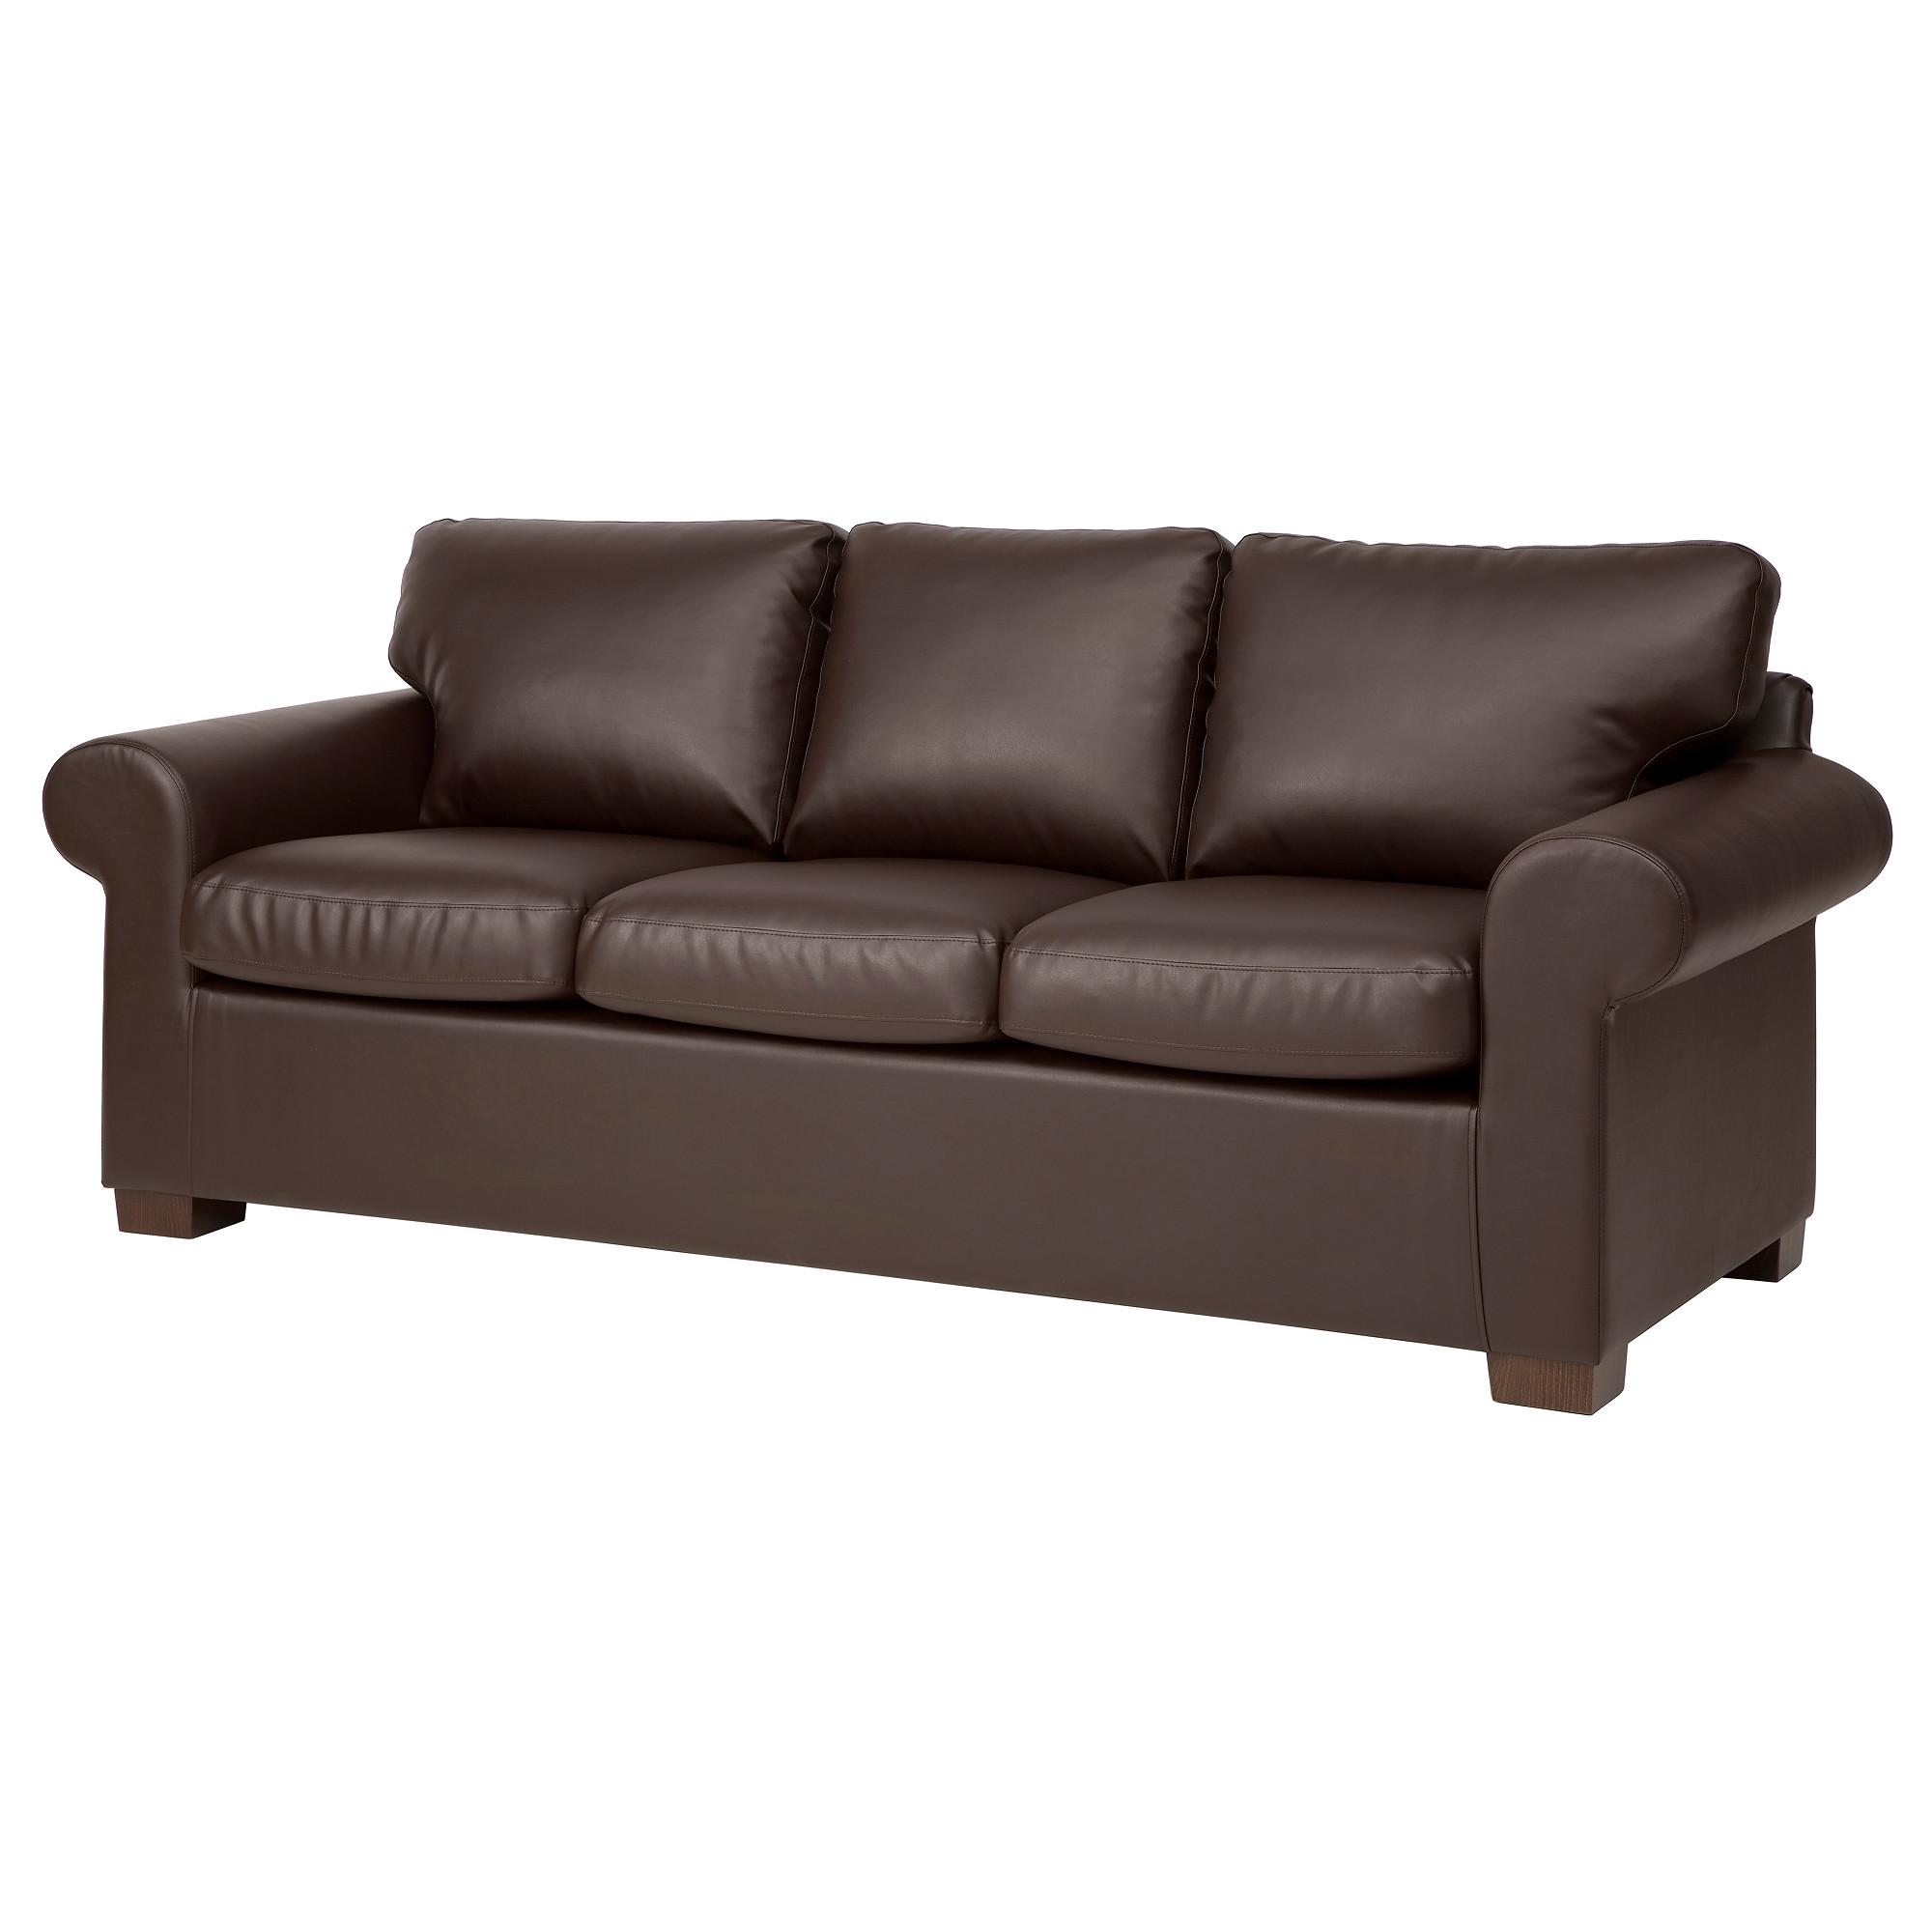 faux leather sofa ektorp sofa, kimstad brown width: 85 7/8  LNAVOIW